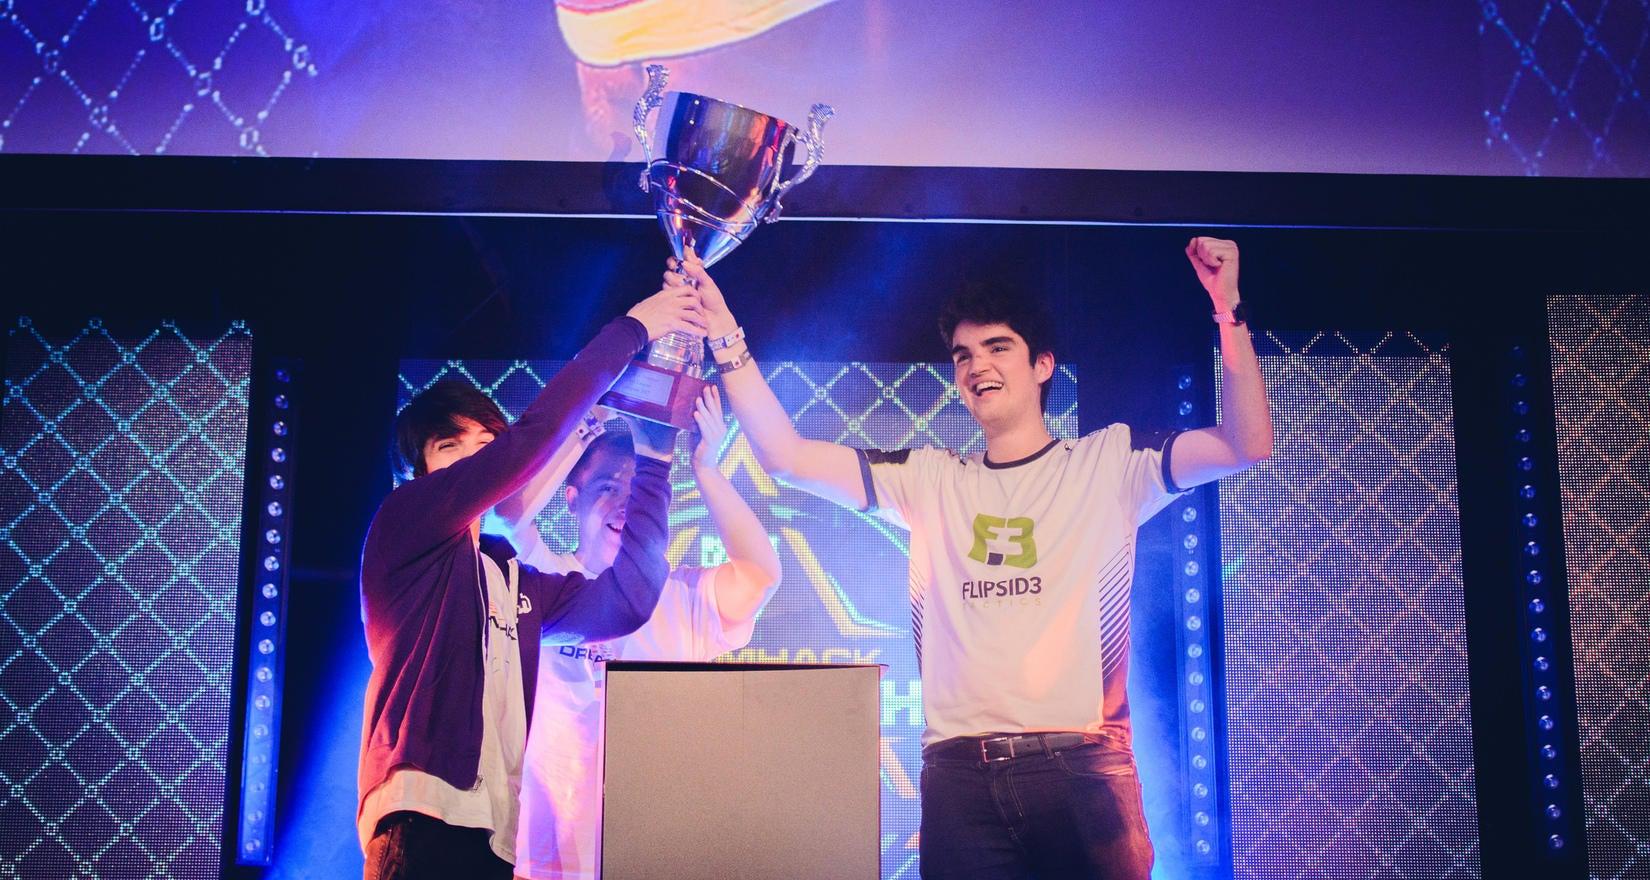 FlipSid3 Tactics Wins The DreamHack Summer Rocket League Championship Image